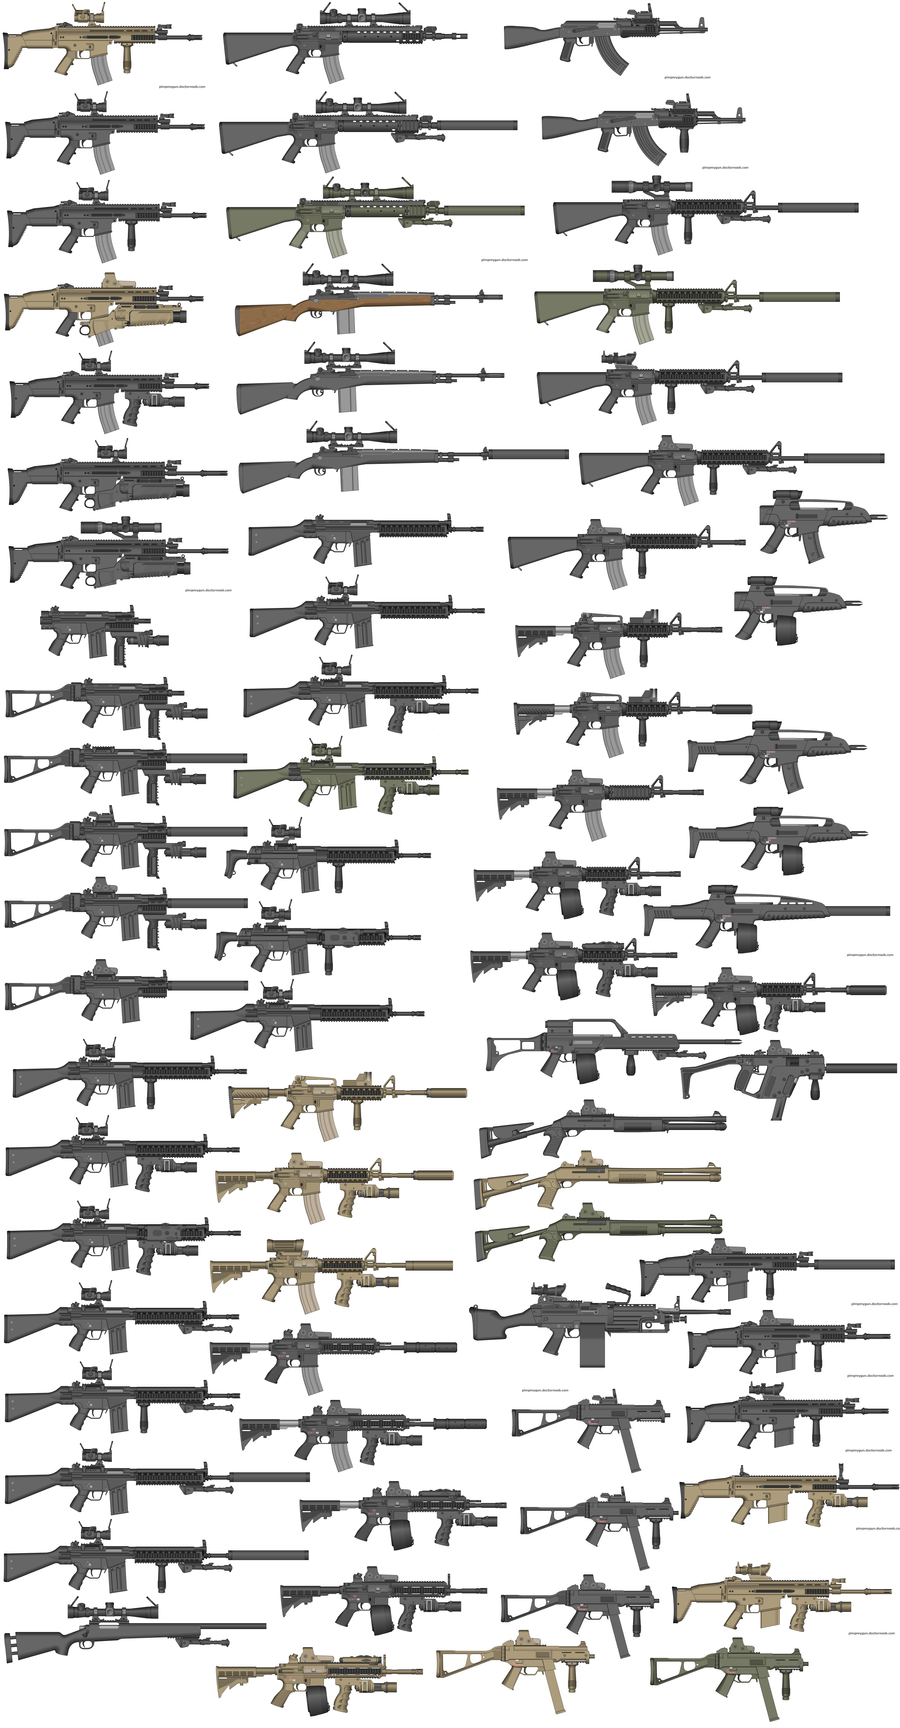 Pimp my gun 2 - More guns by rossriders